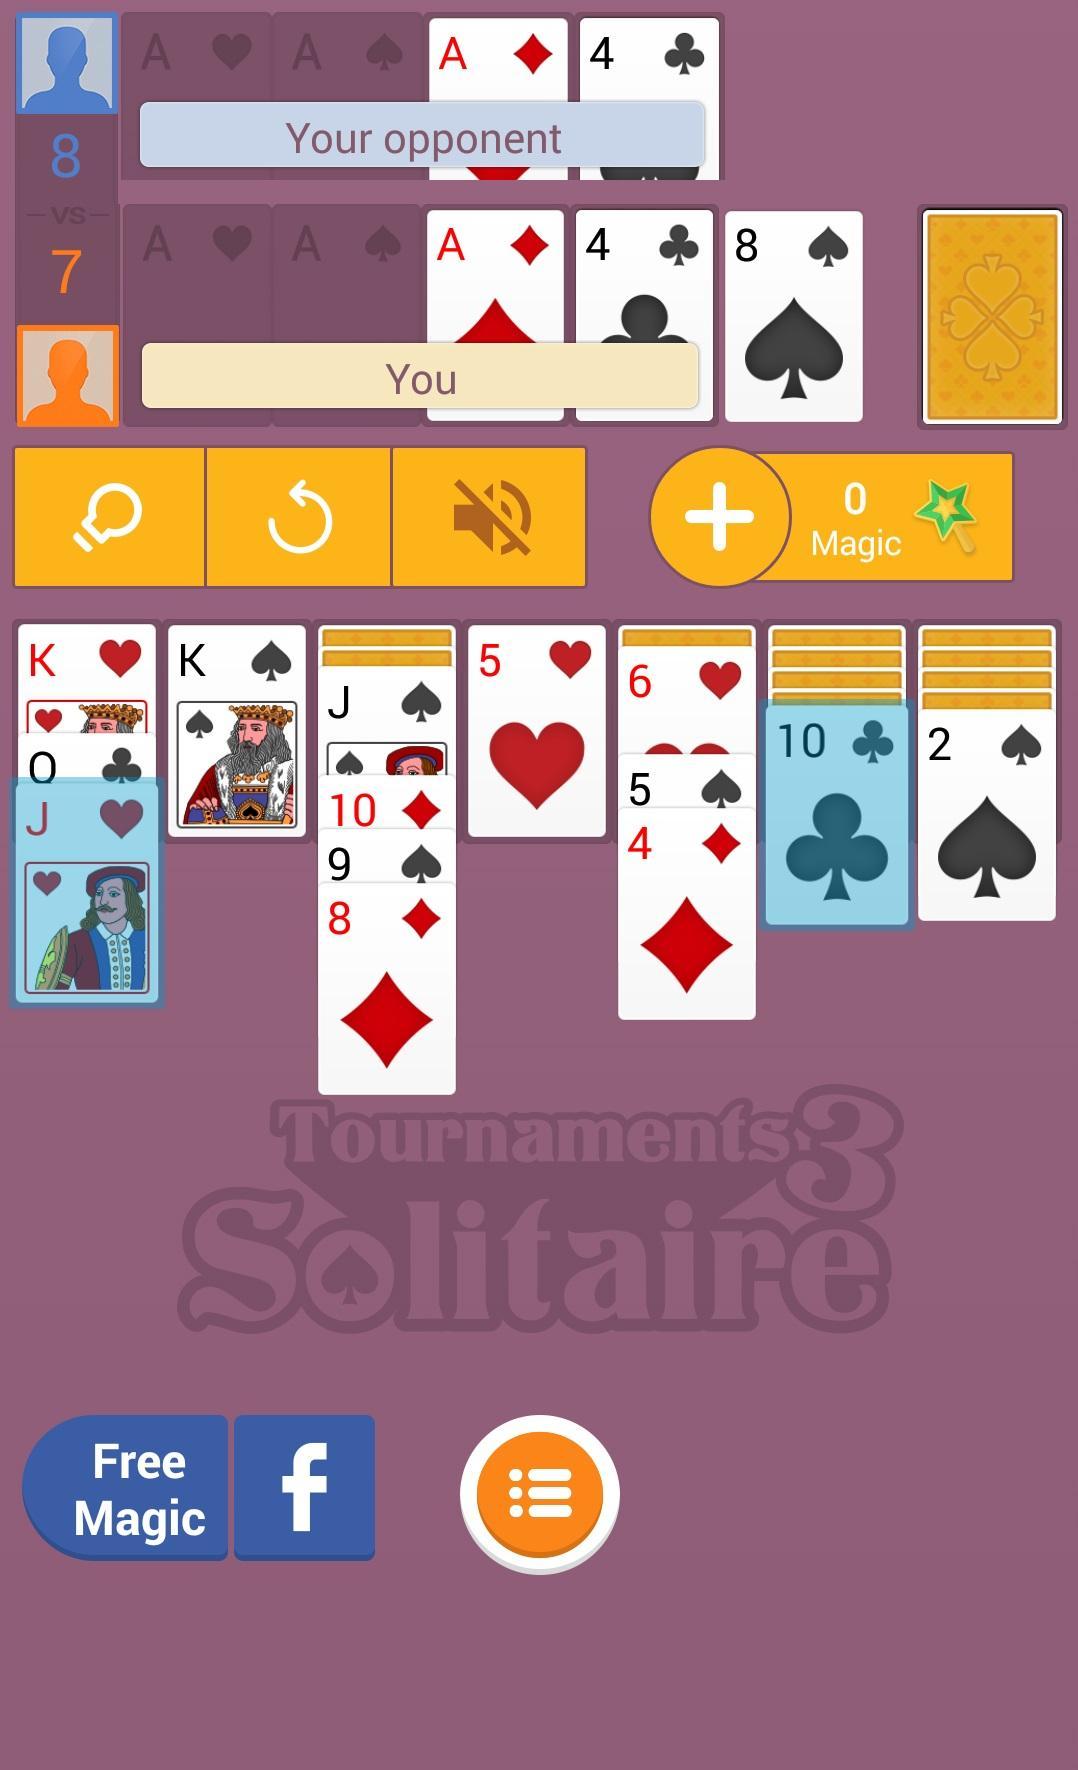 solitaire tricks